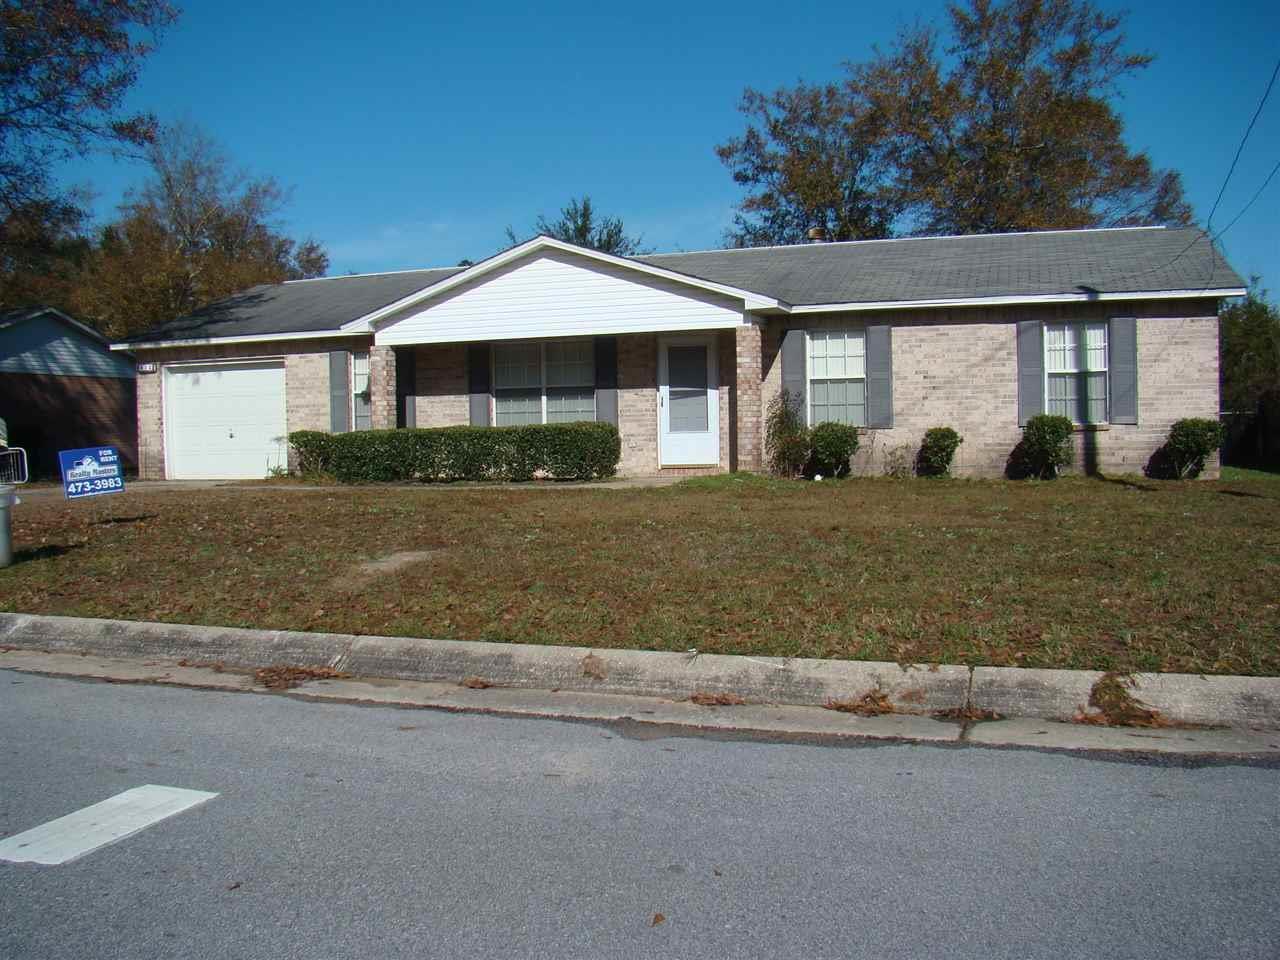 812 Maple Woods Cir, Pensacola, FL 32534